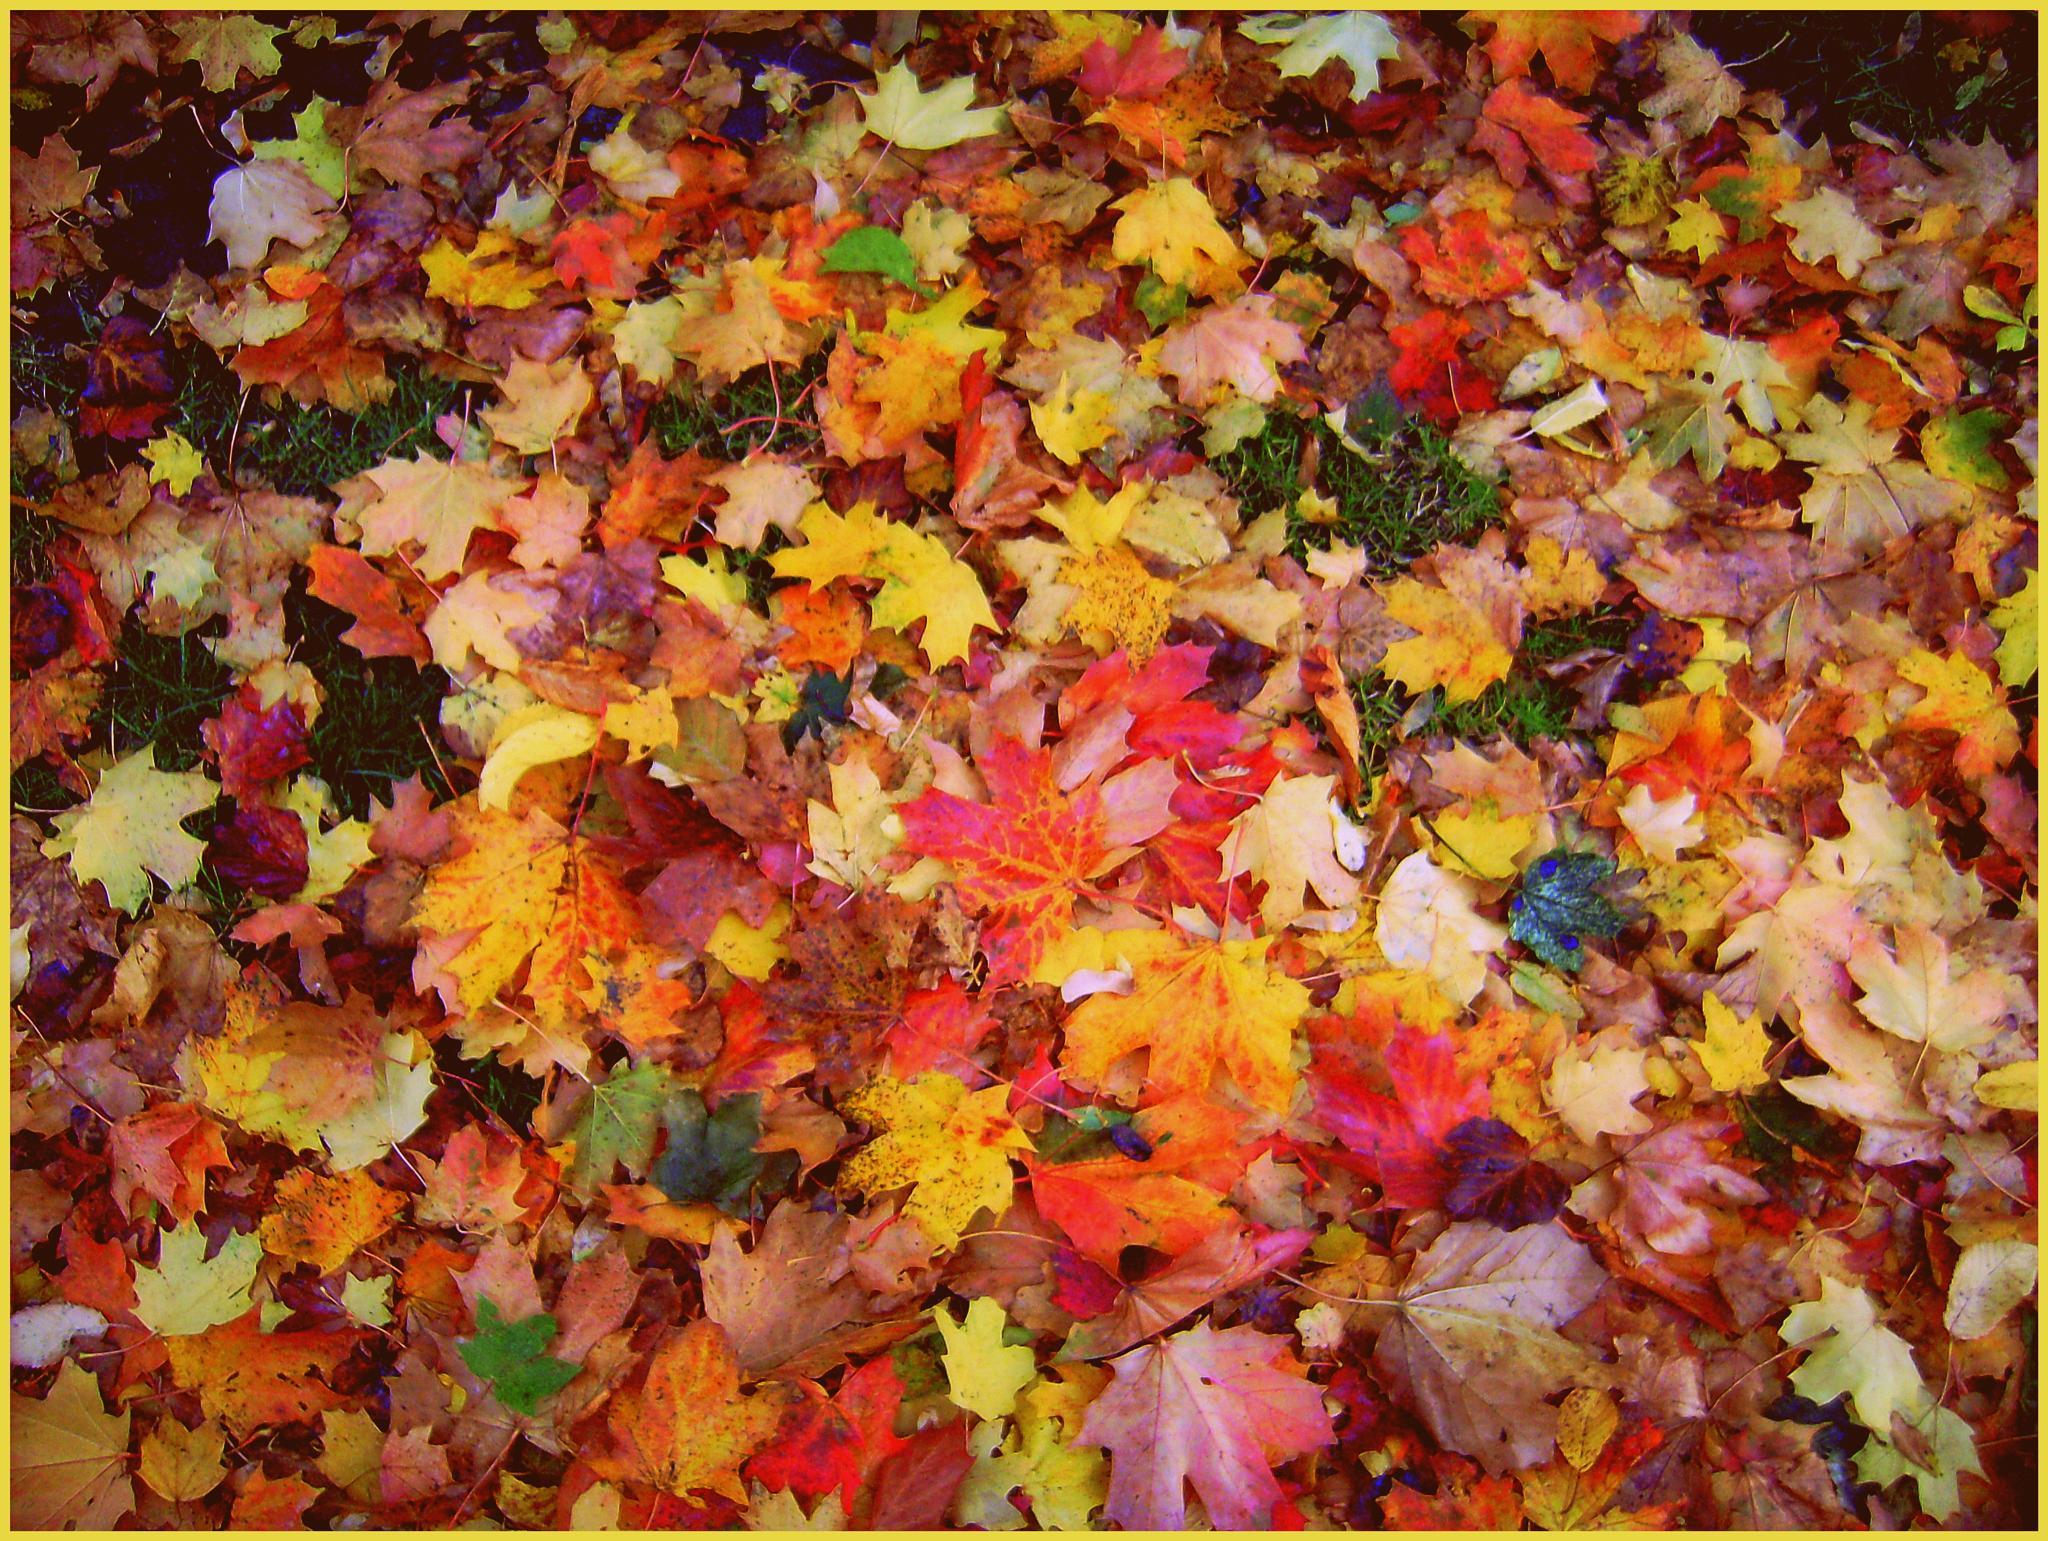 Autumn Colour by Michelle Dimascio